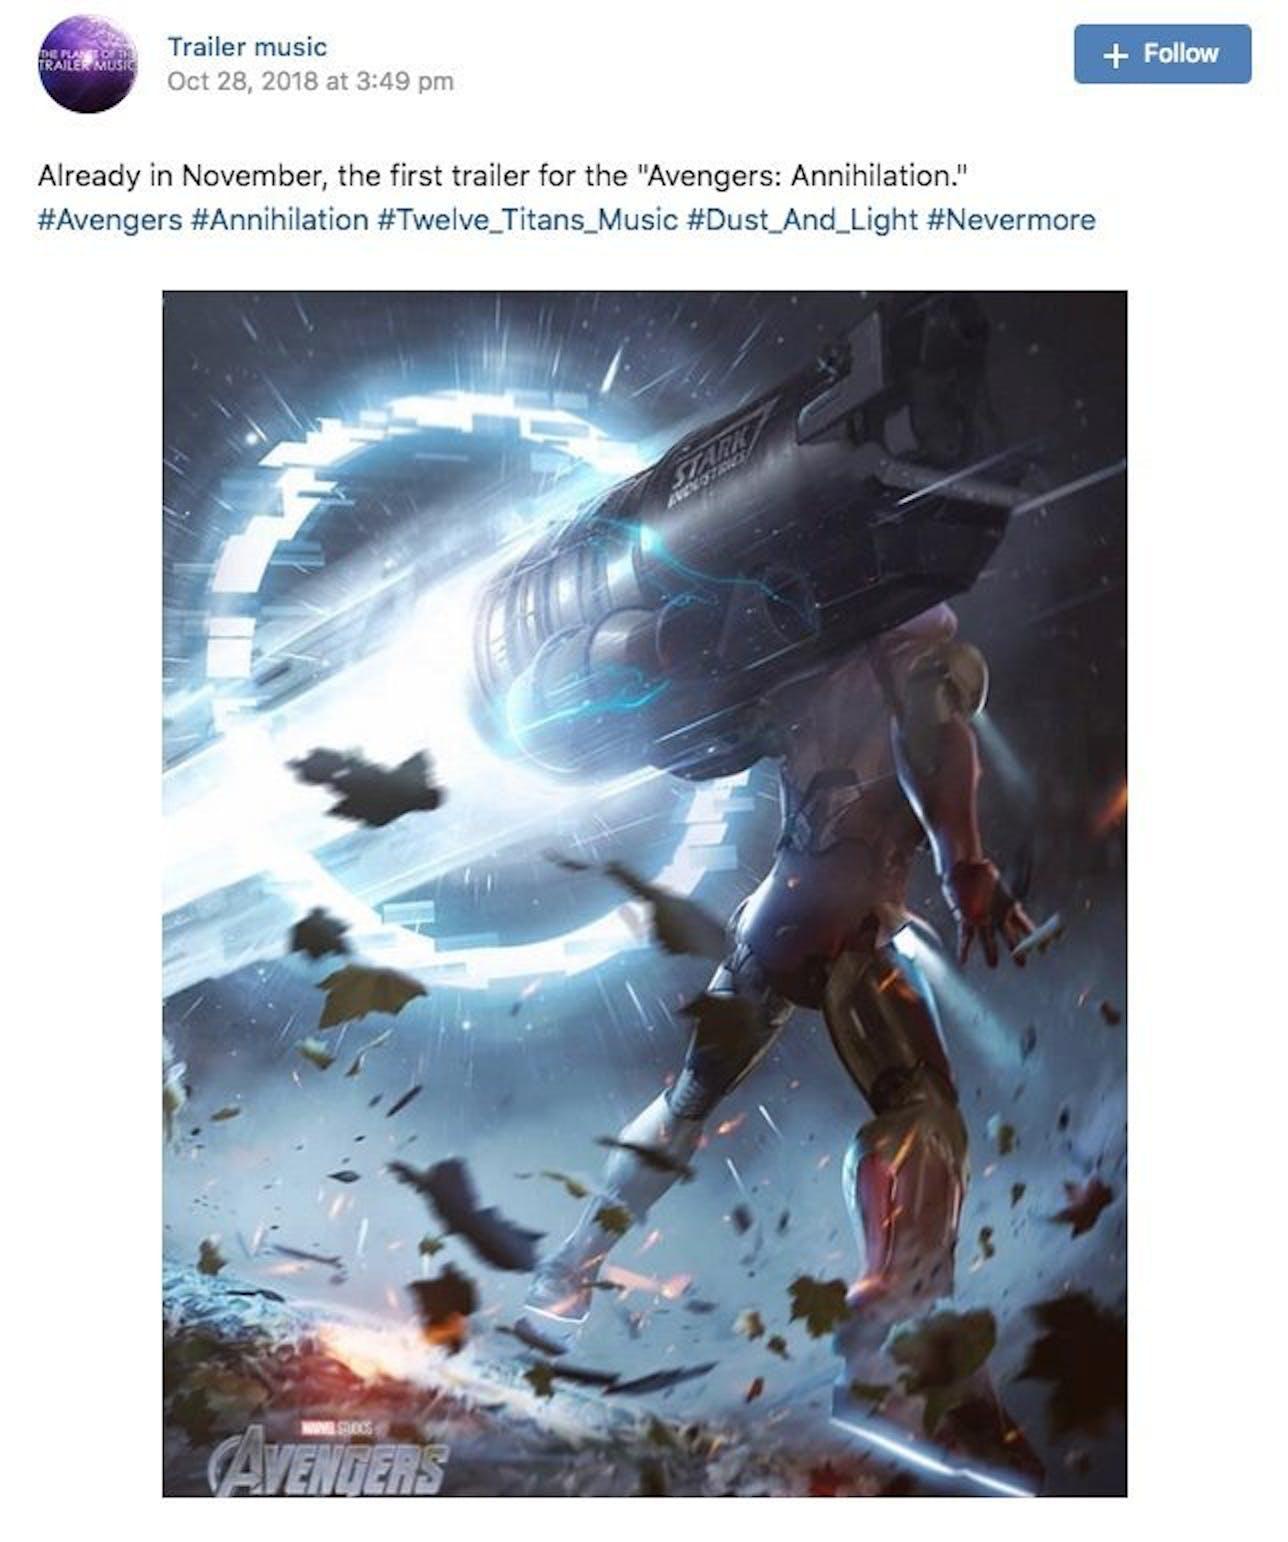 avengers 4 trailer leak teases a moody reunion november release